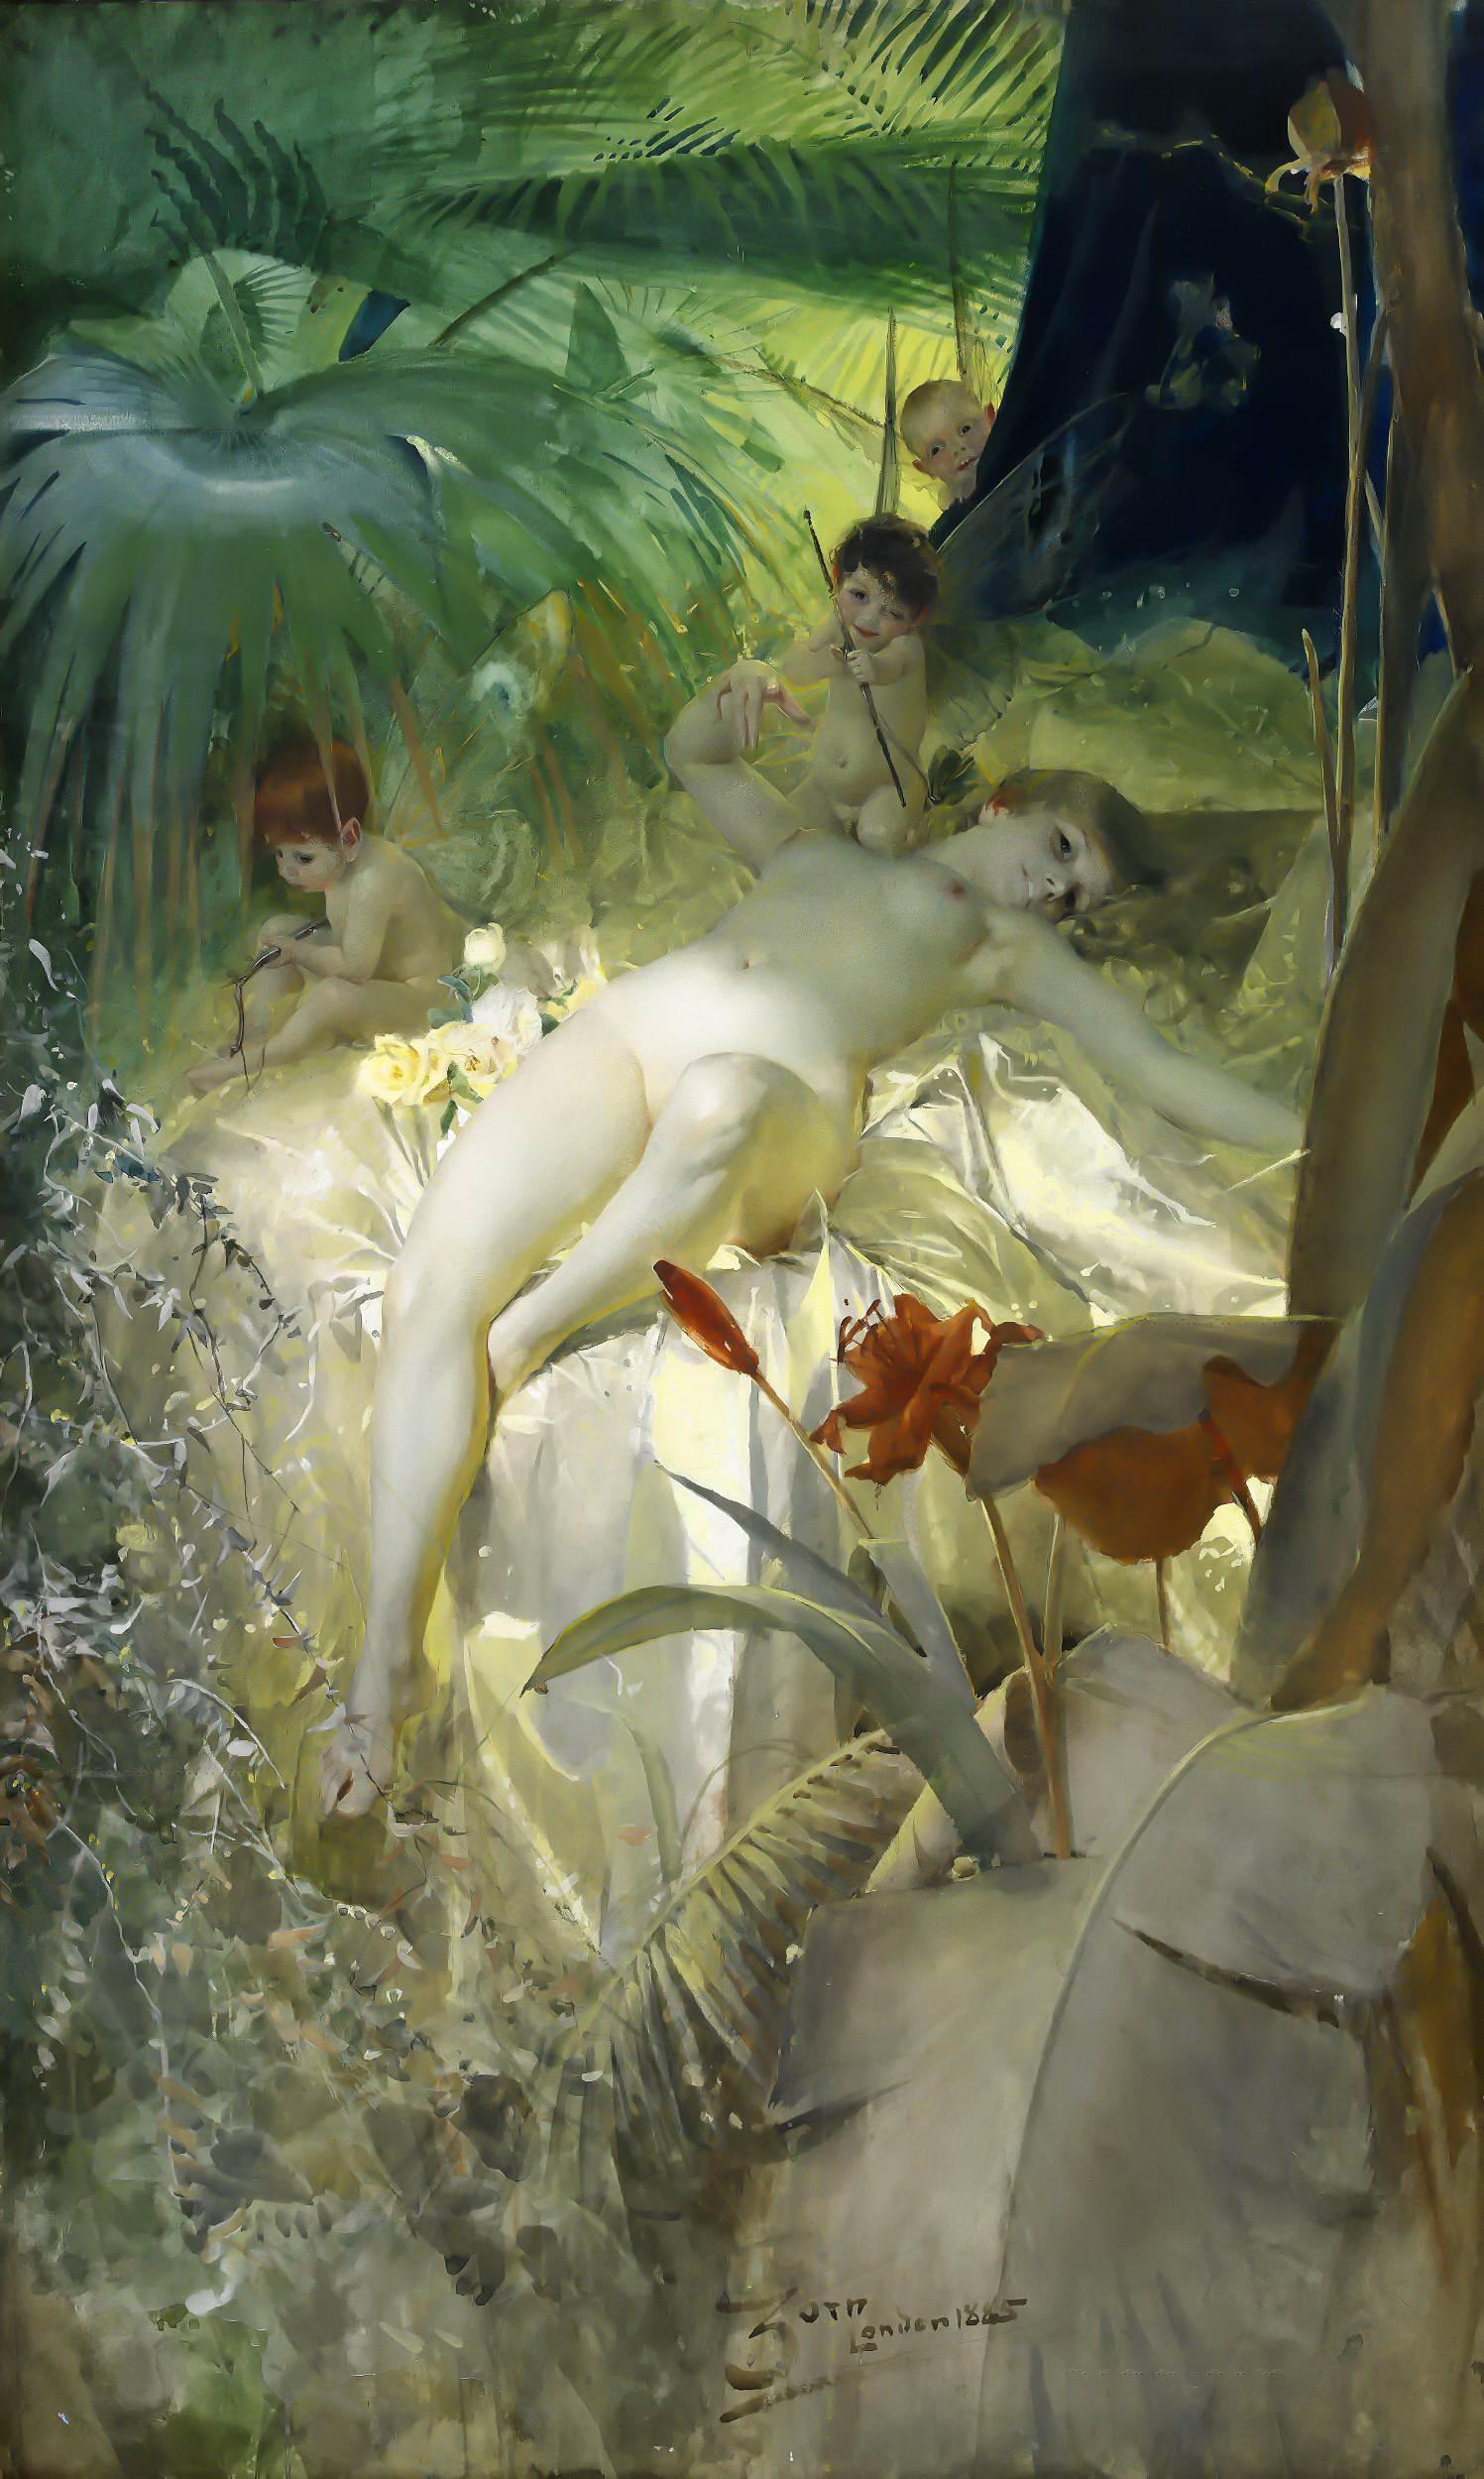 Anders Leonard Zorn. 1860-1920. Нимфа любви. 1885, 106 х 64 см. Частная коллекция